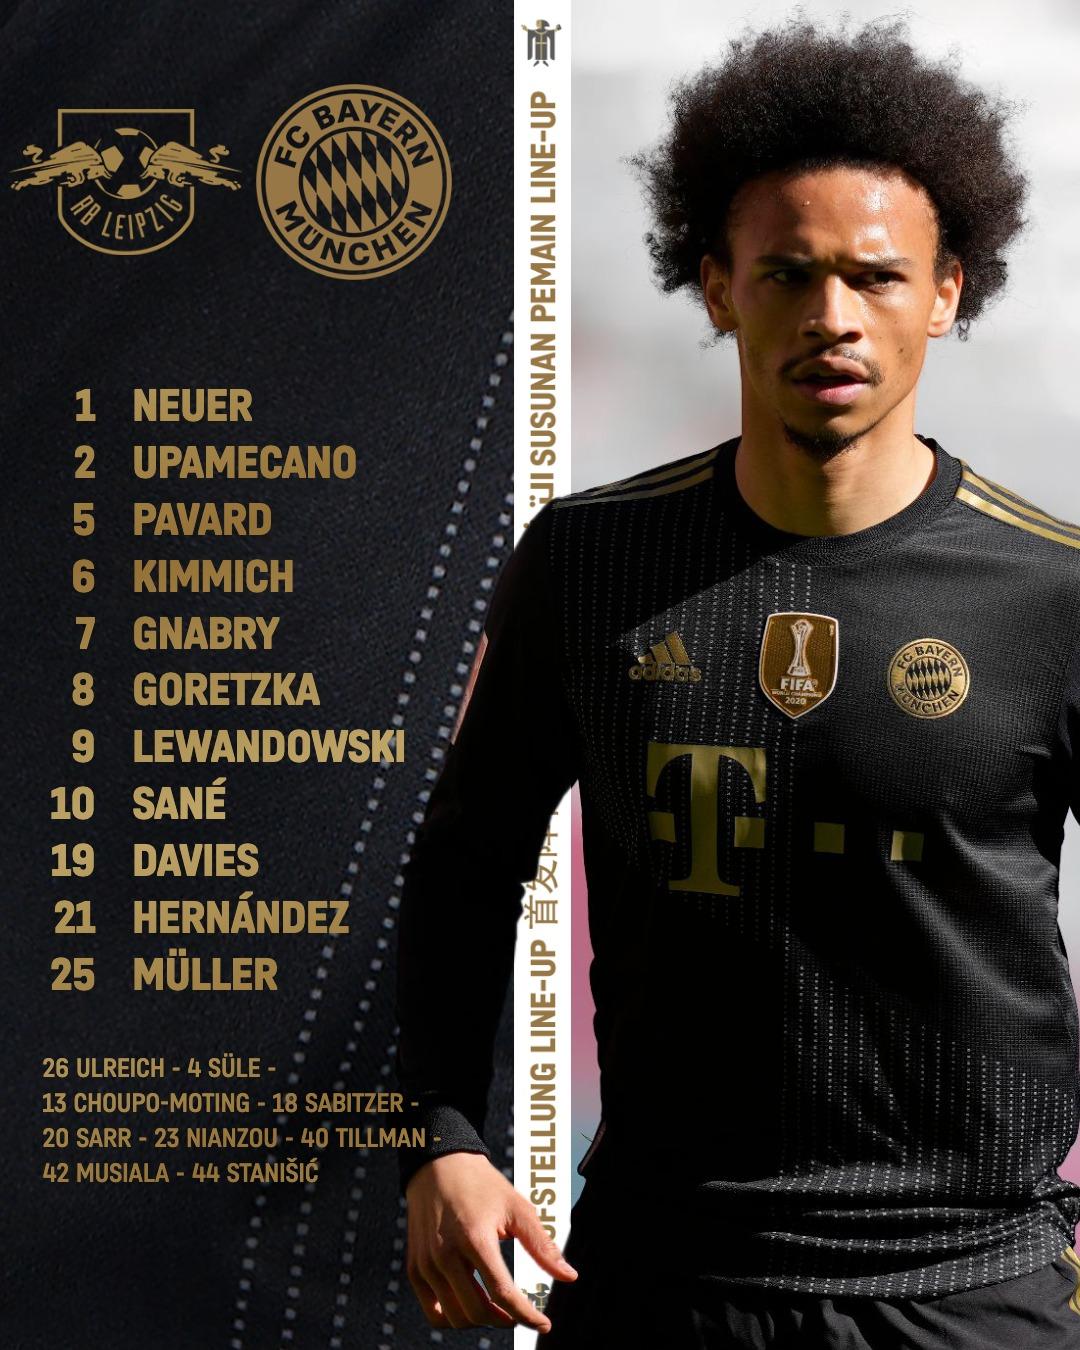 "The Bundesliga & 2. Superliga DELUXE ""Bundesgalactica"" 2021/22 Thread - Page 4 E_A7OoUWQAQFiXY?format=jpg&name=large"